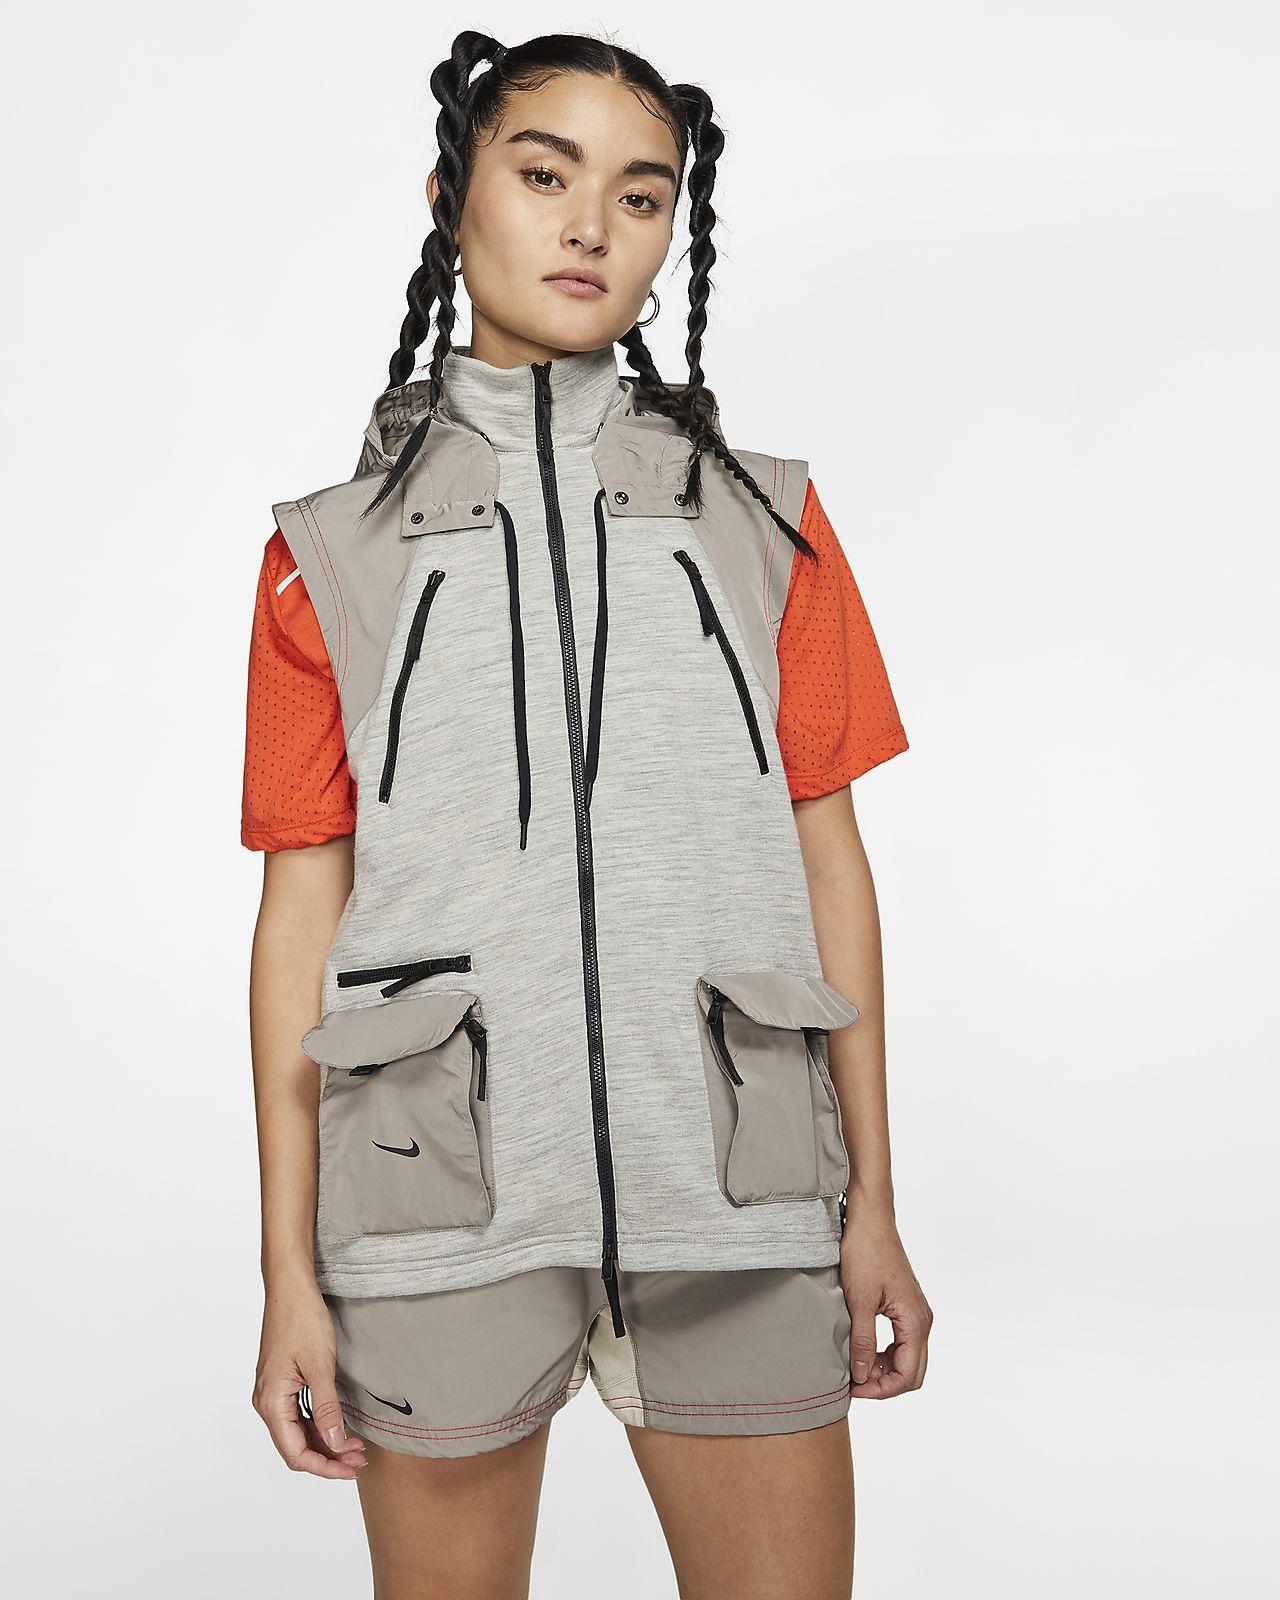 Nike A.A.E. Women's Vest